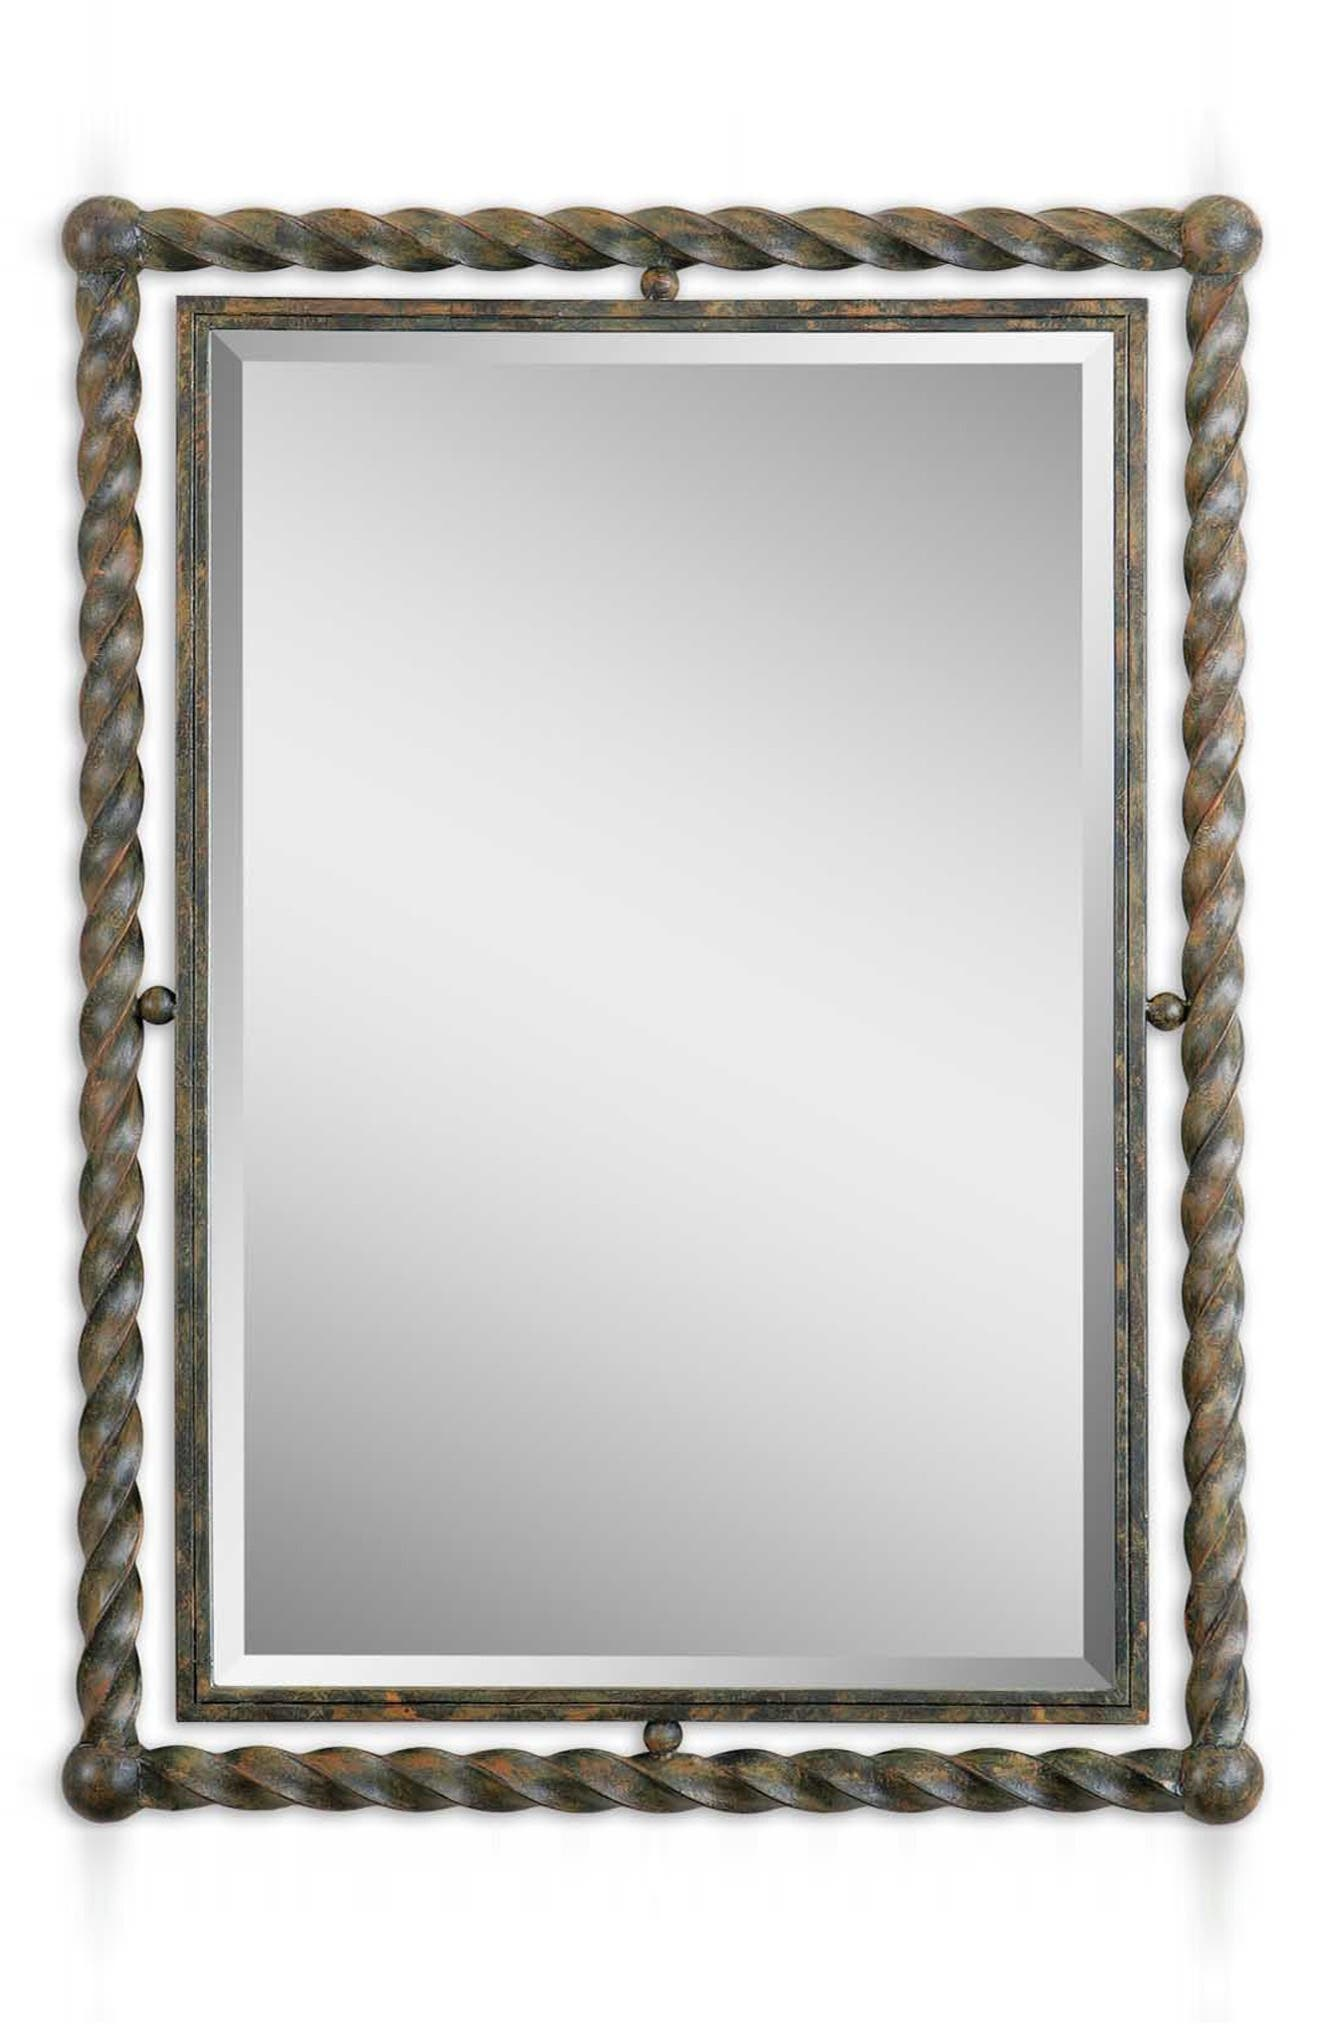 'Garrick' Wrought Iron Mirror,                             Alternate thumbnail 3, color,                             200